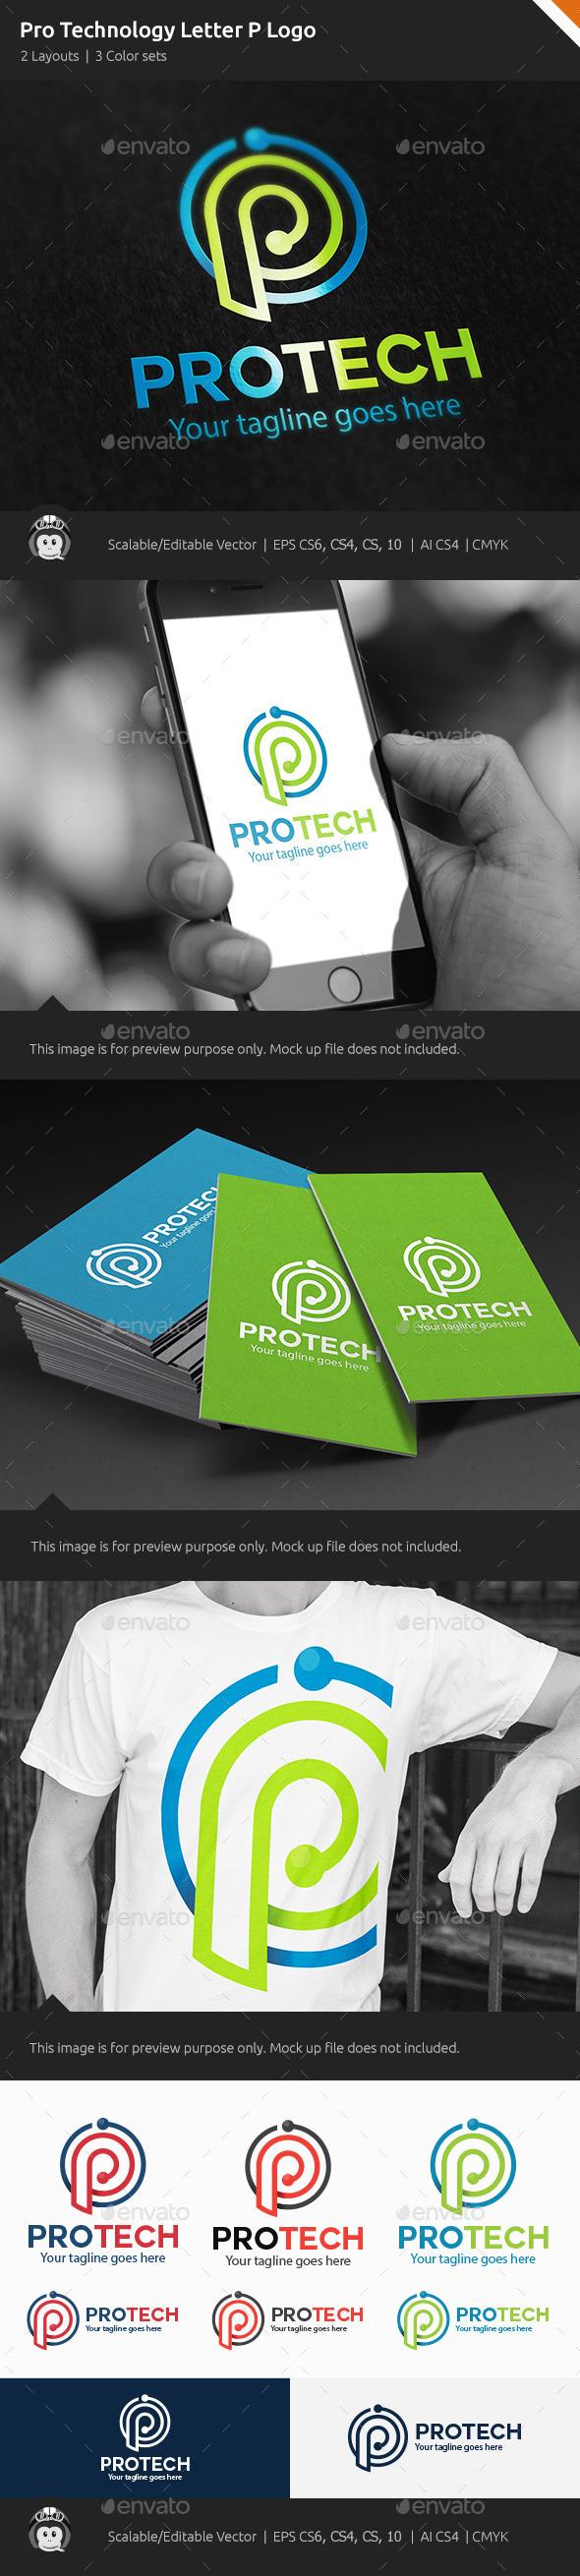 GraphicRiver Pro Technology Letter P Logo 10378521